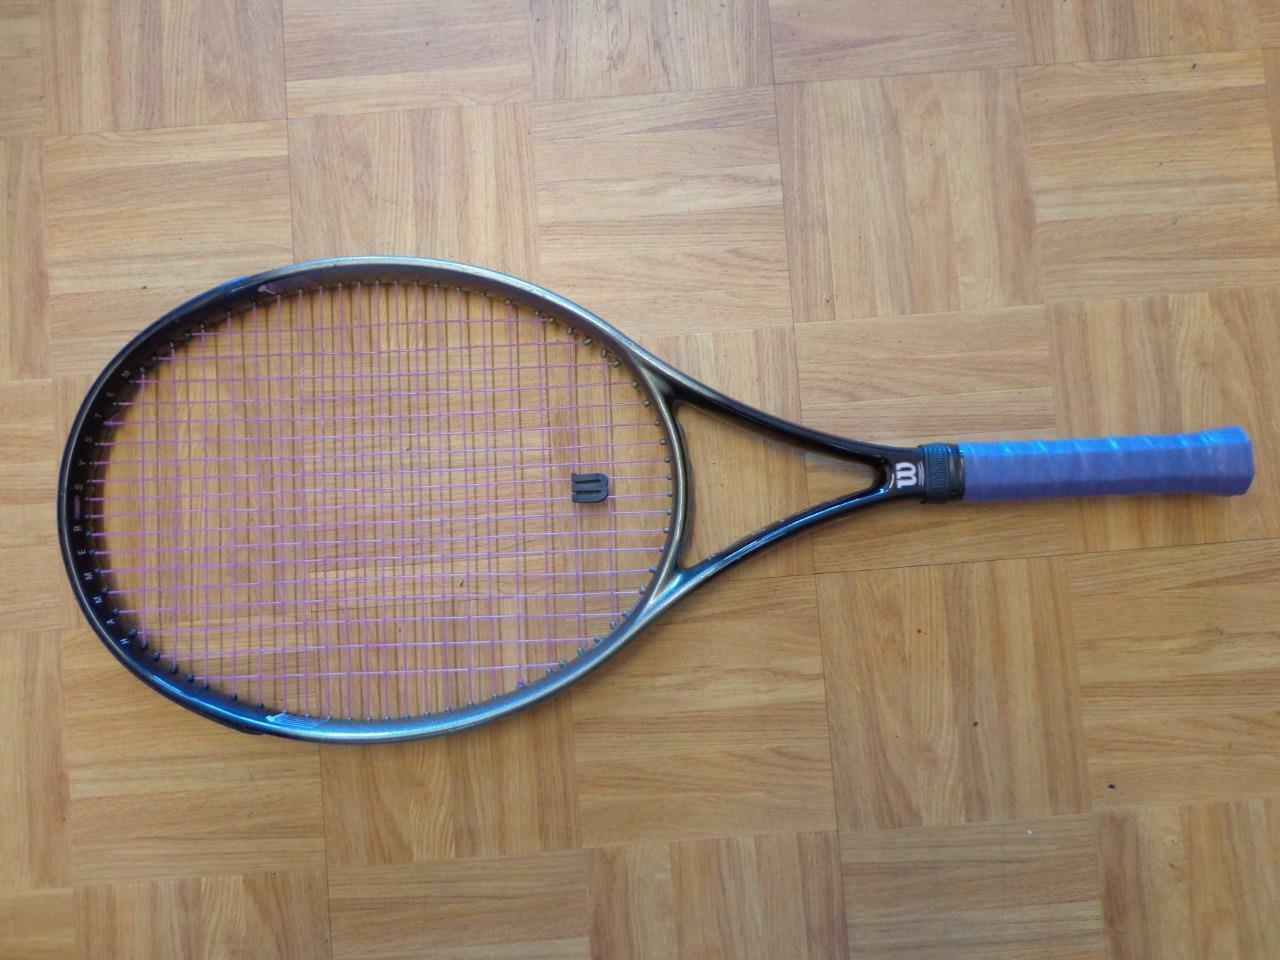 Perfil de martillo Wilson 2.7 2.7 2.7 cabeza de gran tamaño 110 4 1 4 Grip Tenis Raqueta f476af